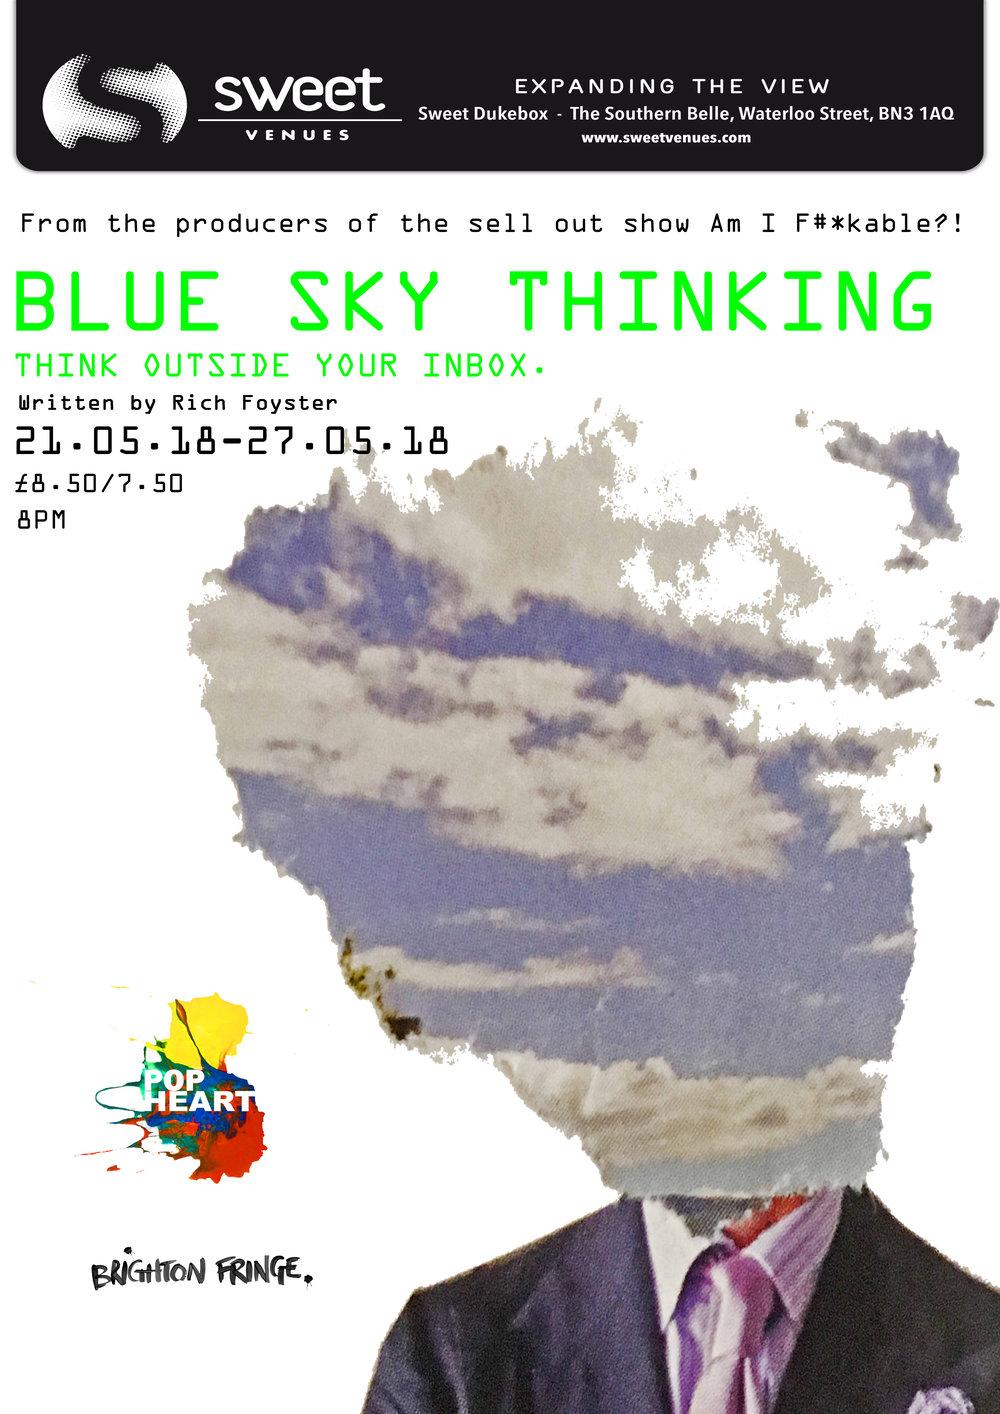 Blue sky thinking poster a3 final.jpg